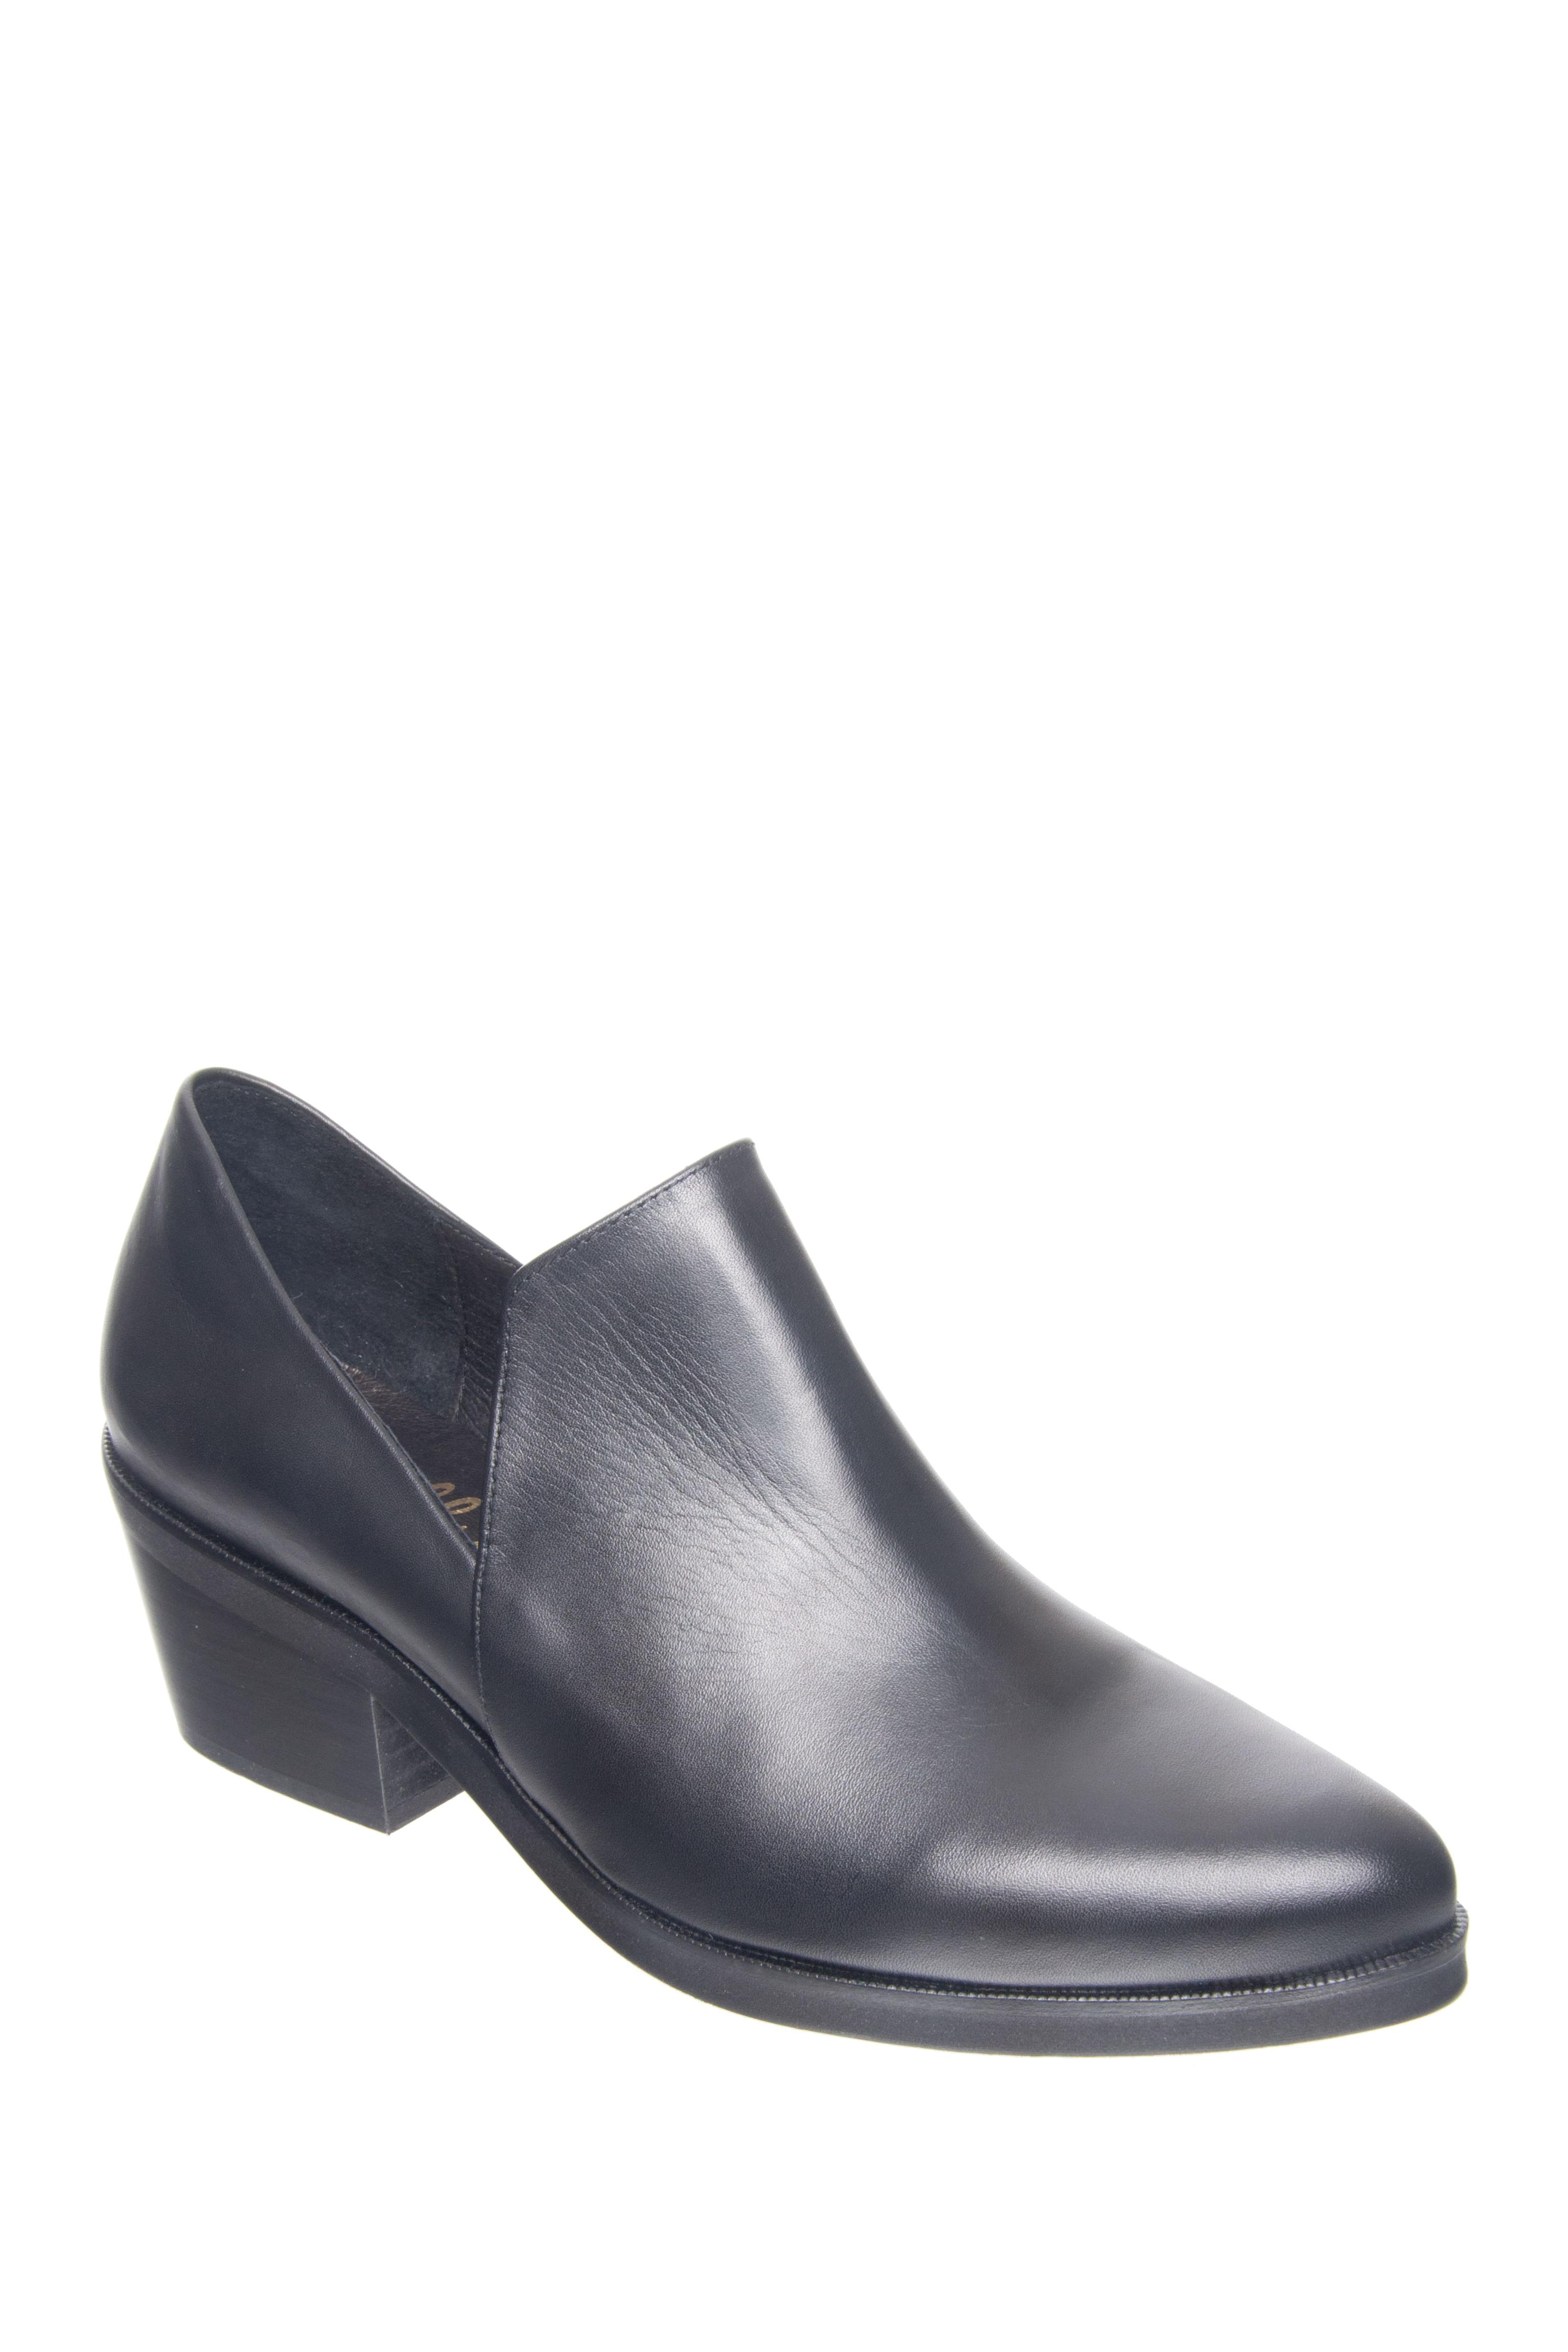 Shellys London Johnna Mid Heel Shoes - Black